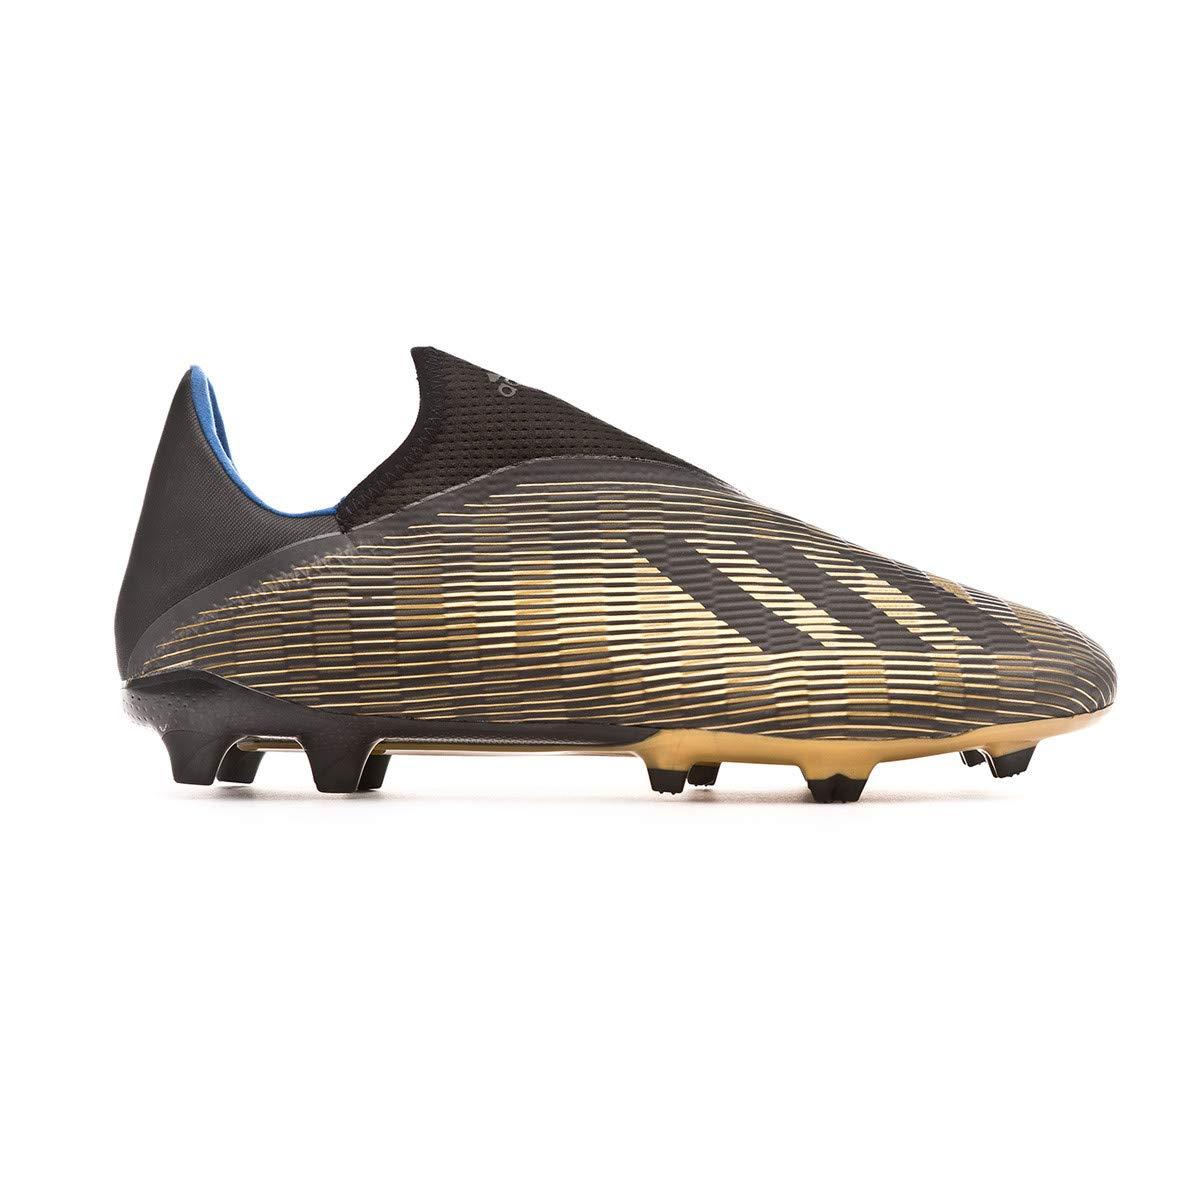 Core Black-Gold Metallic adidas X 19.3 LL FG Bota de f/útbol